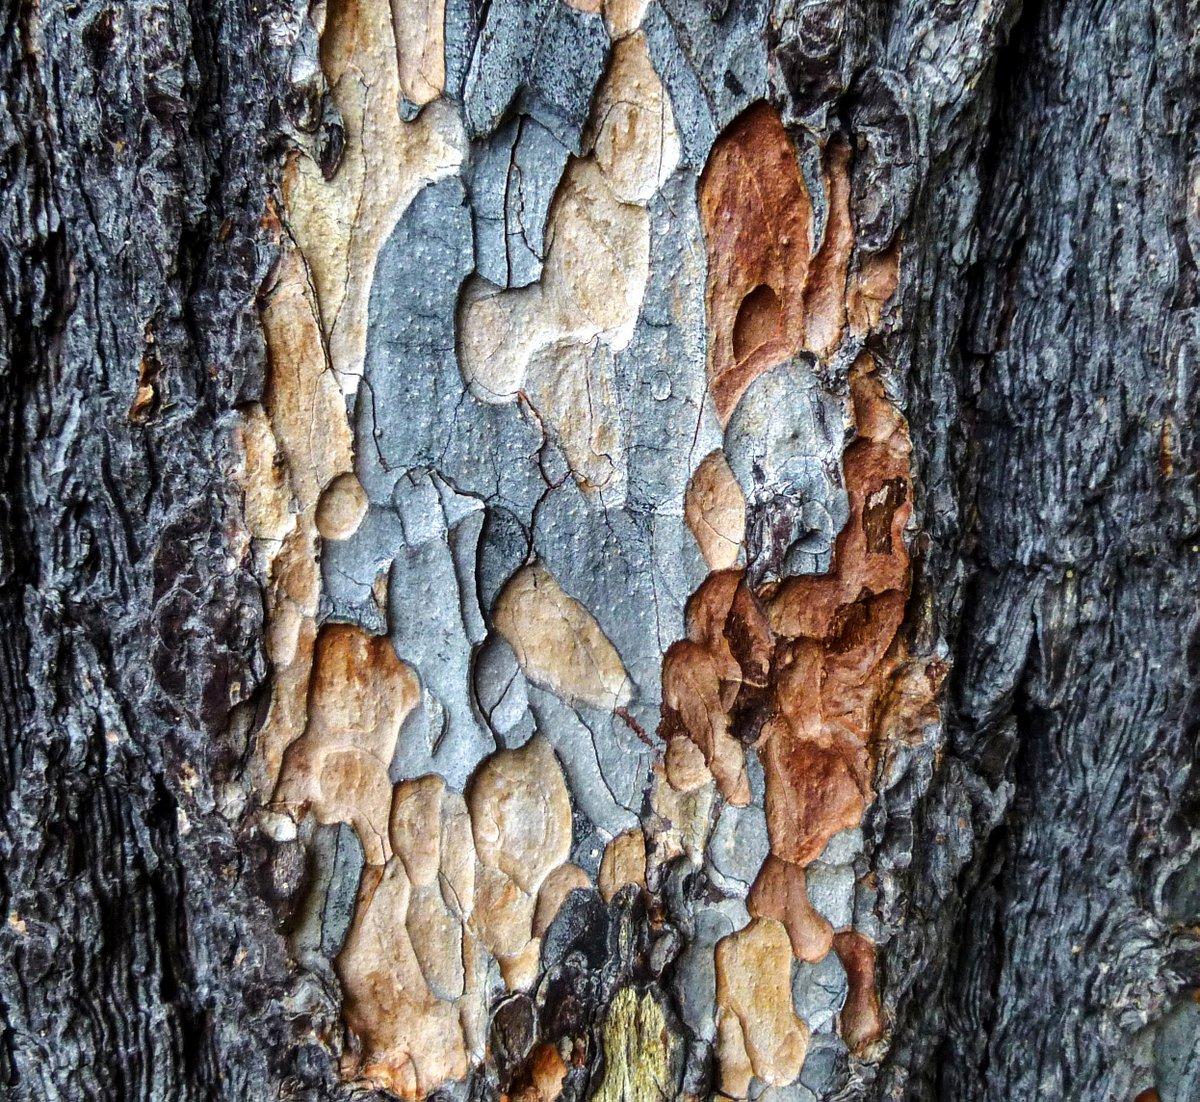 17. White Pine Bark